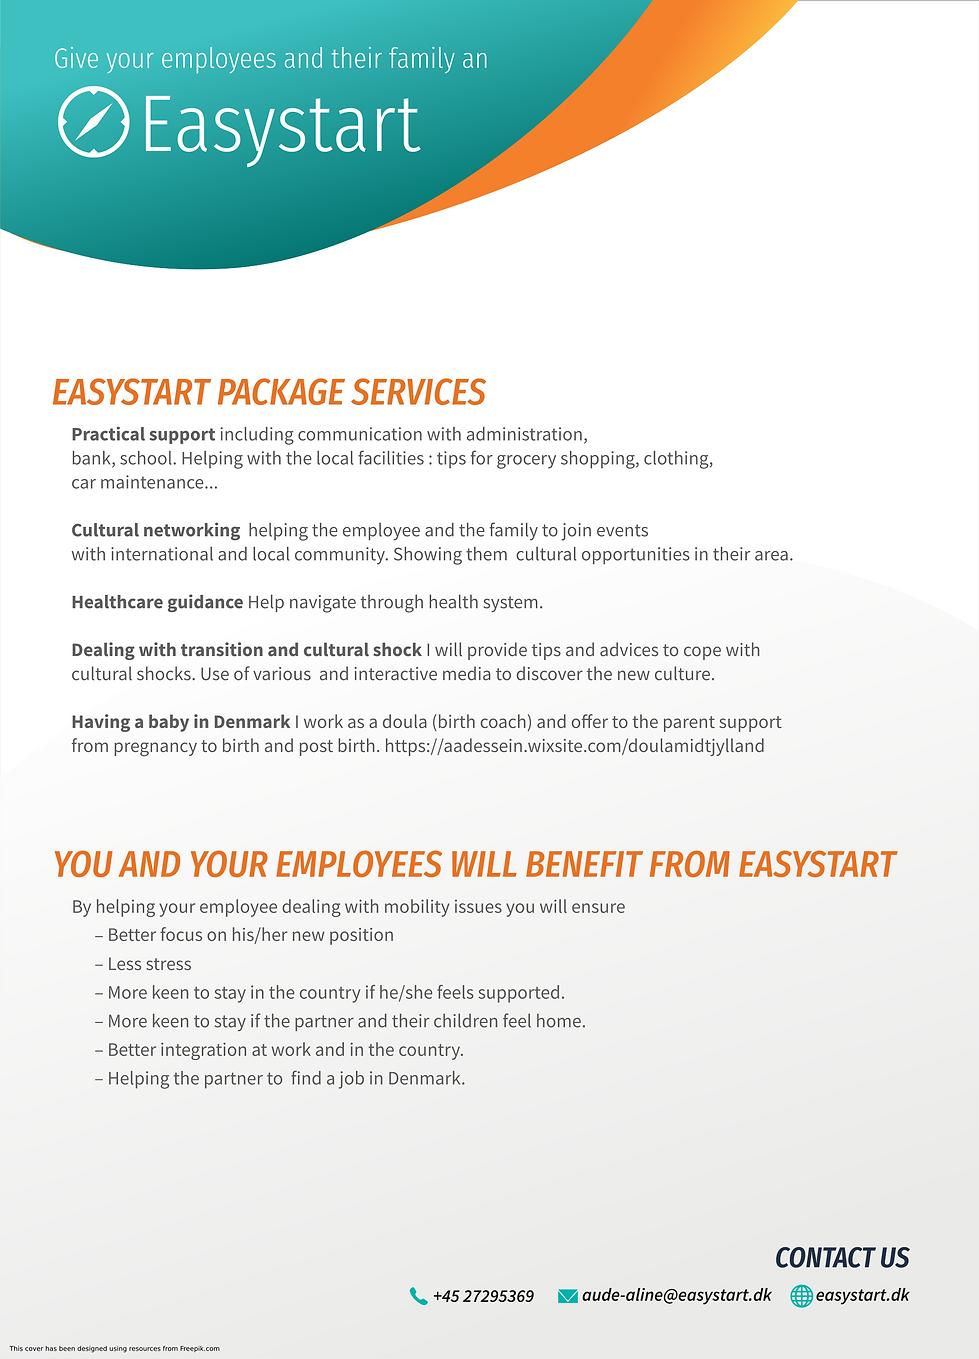 Easystart-verso_v2.png